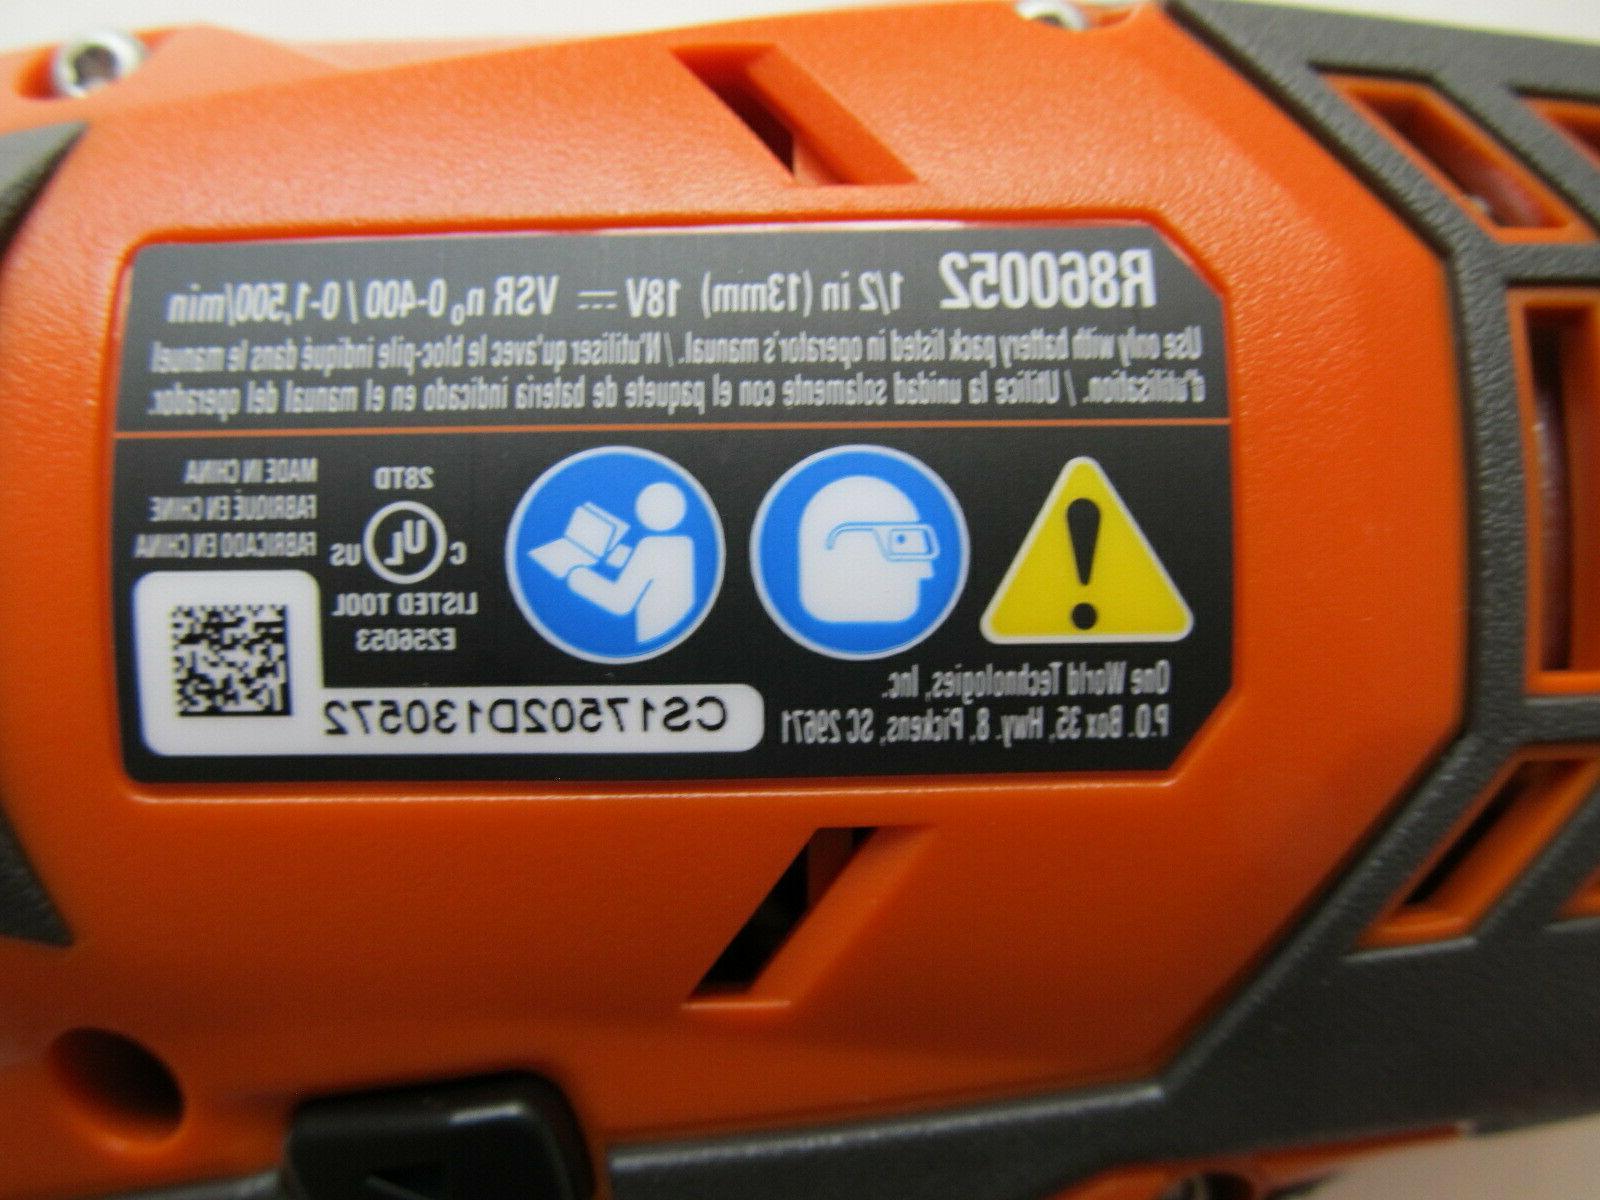 Ridgid R860052 Cordless 1/2 in. Compact Drill/Driver NEW